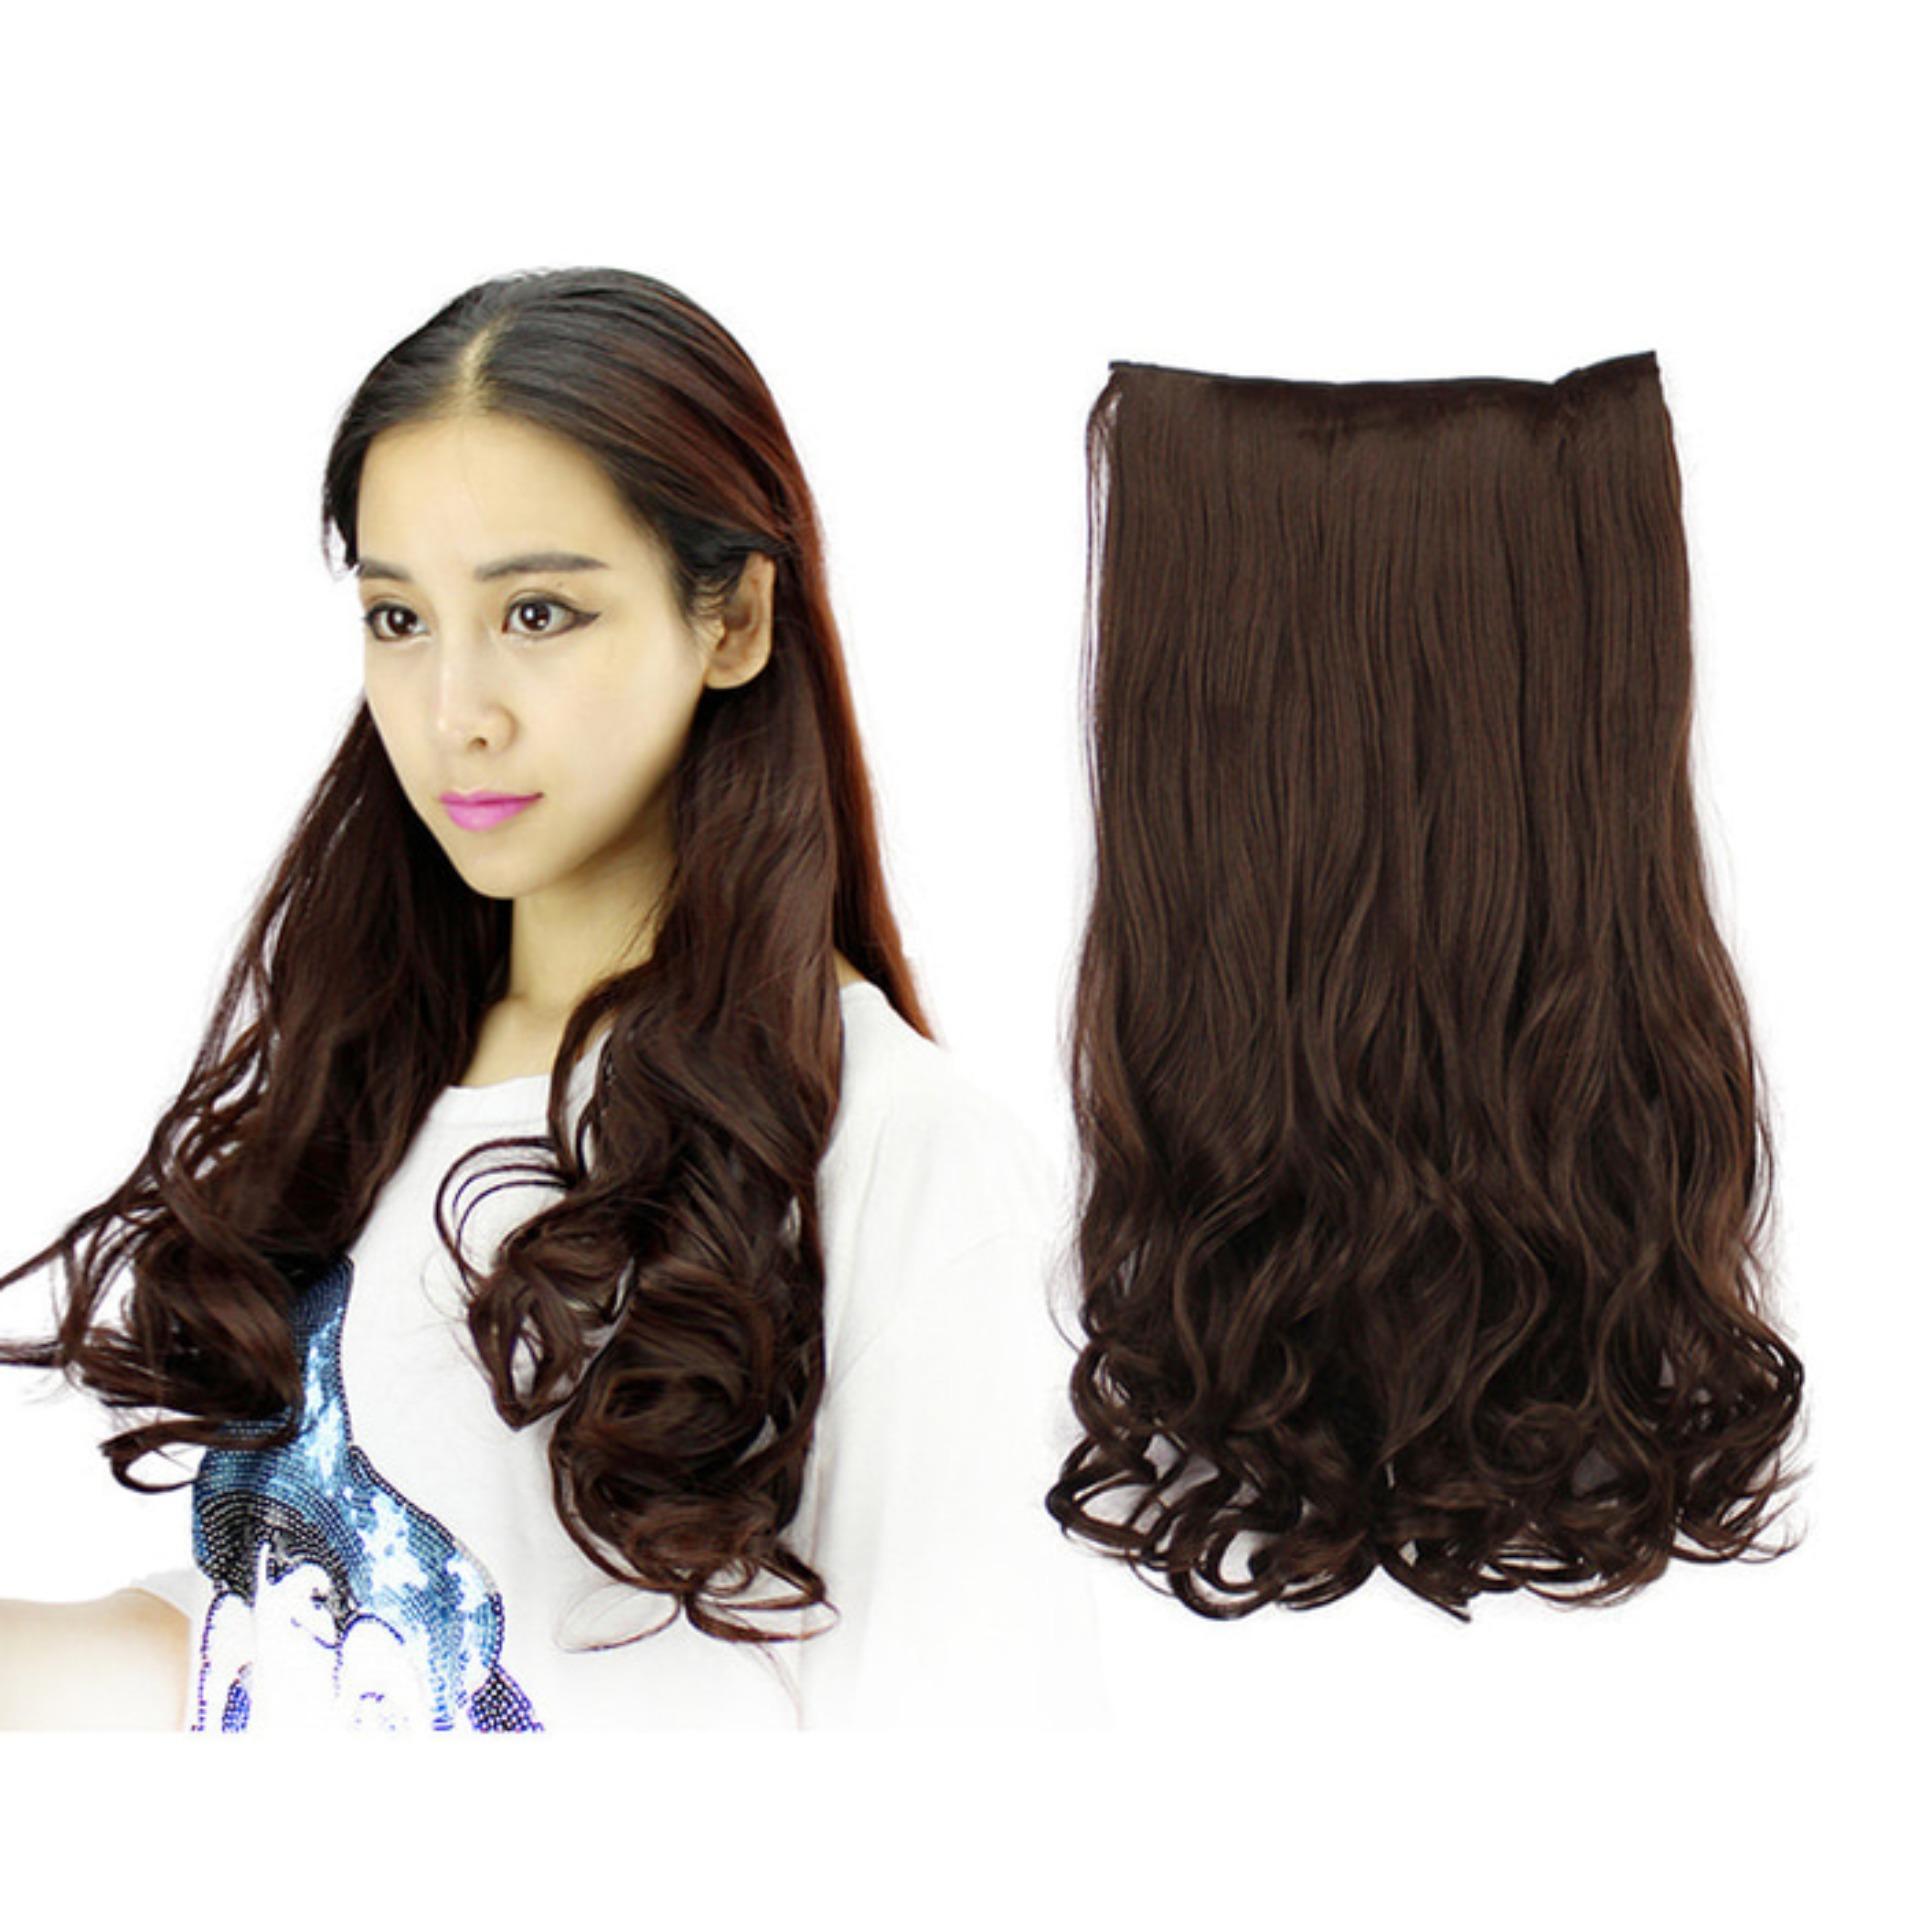 Rambut Palsu Wanita Curly Hitam Haiclip Panjang Murah